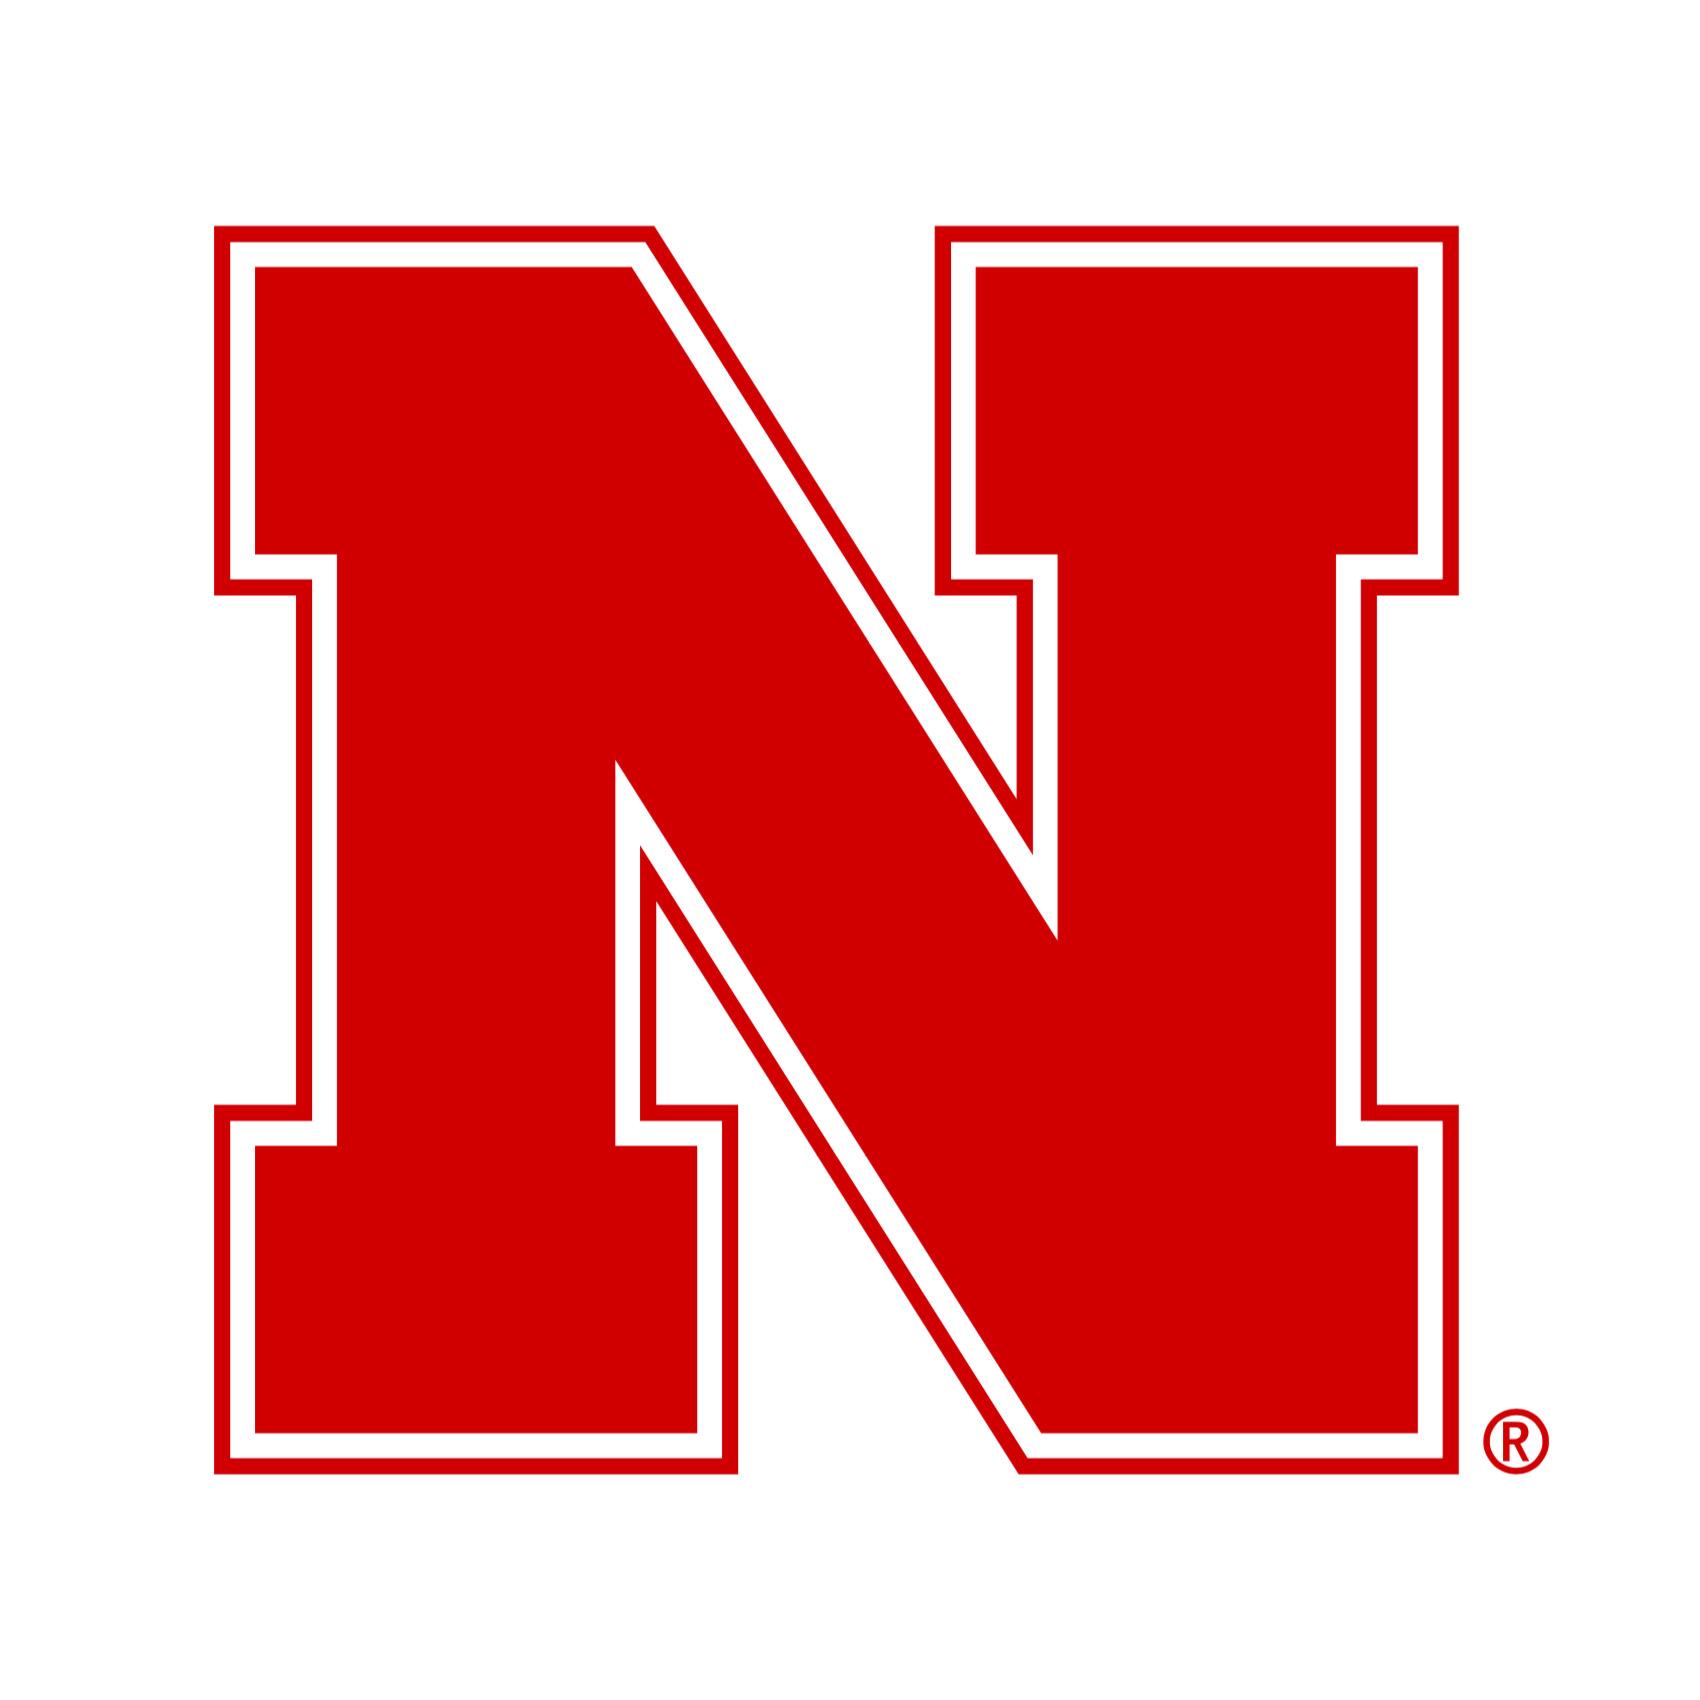 Nebraska N campus icon